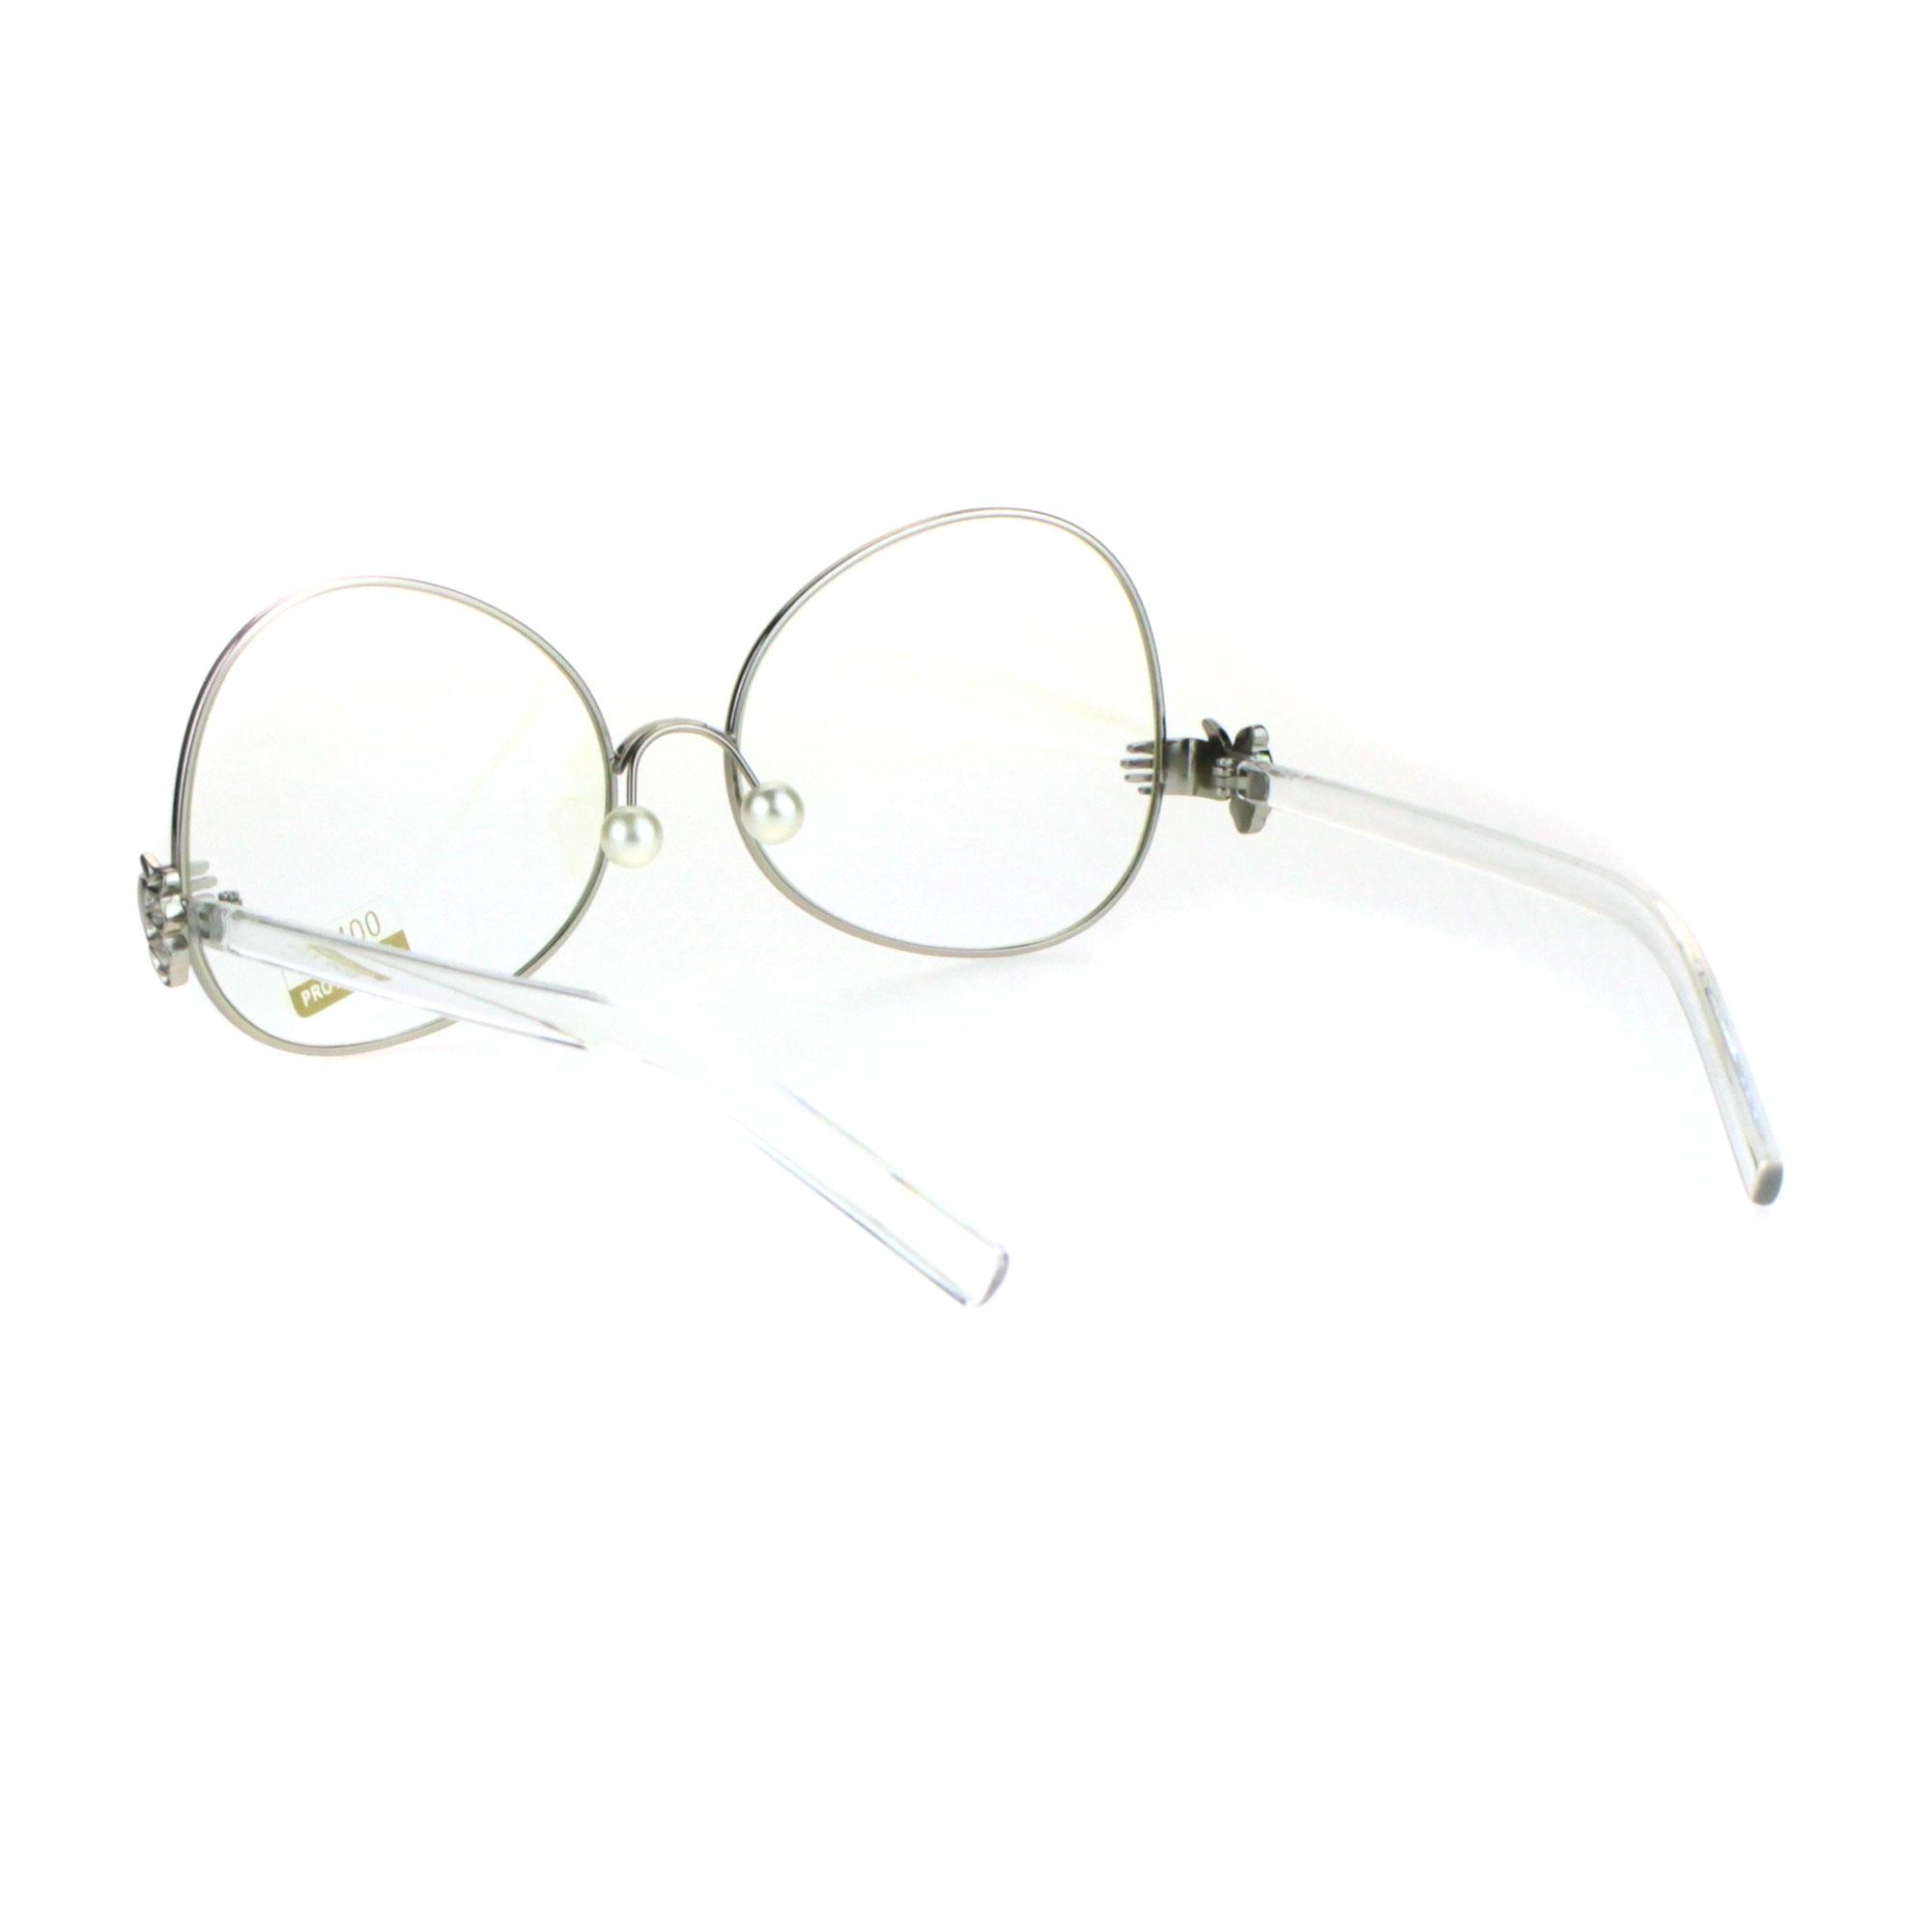 Pearl Nose Pad Clown Hand Hinge Drop Temple Swan Eye Glasses